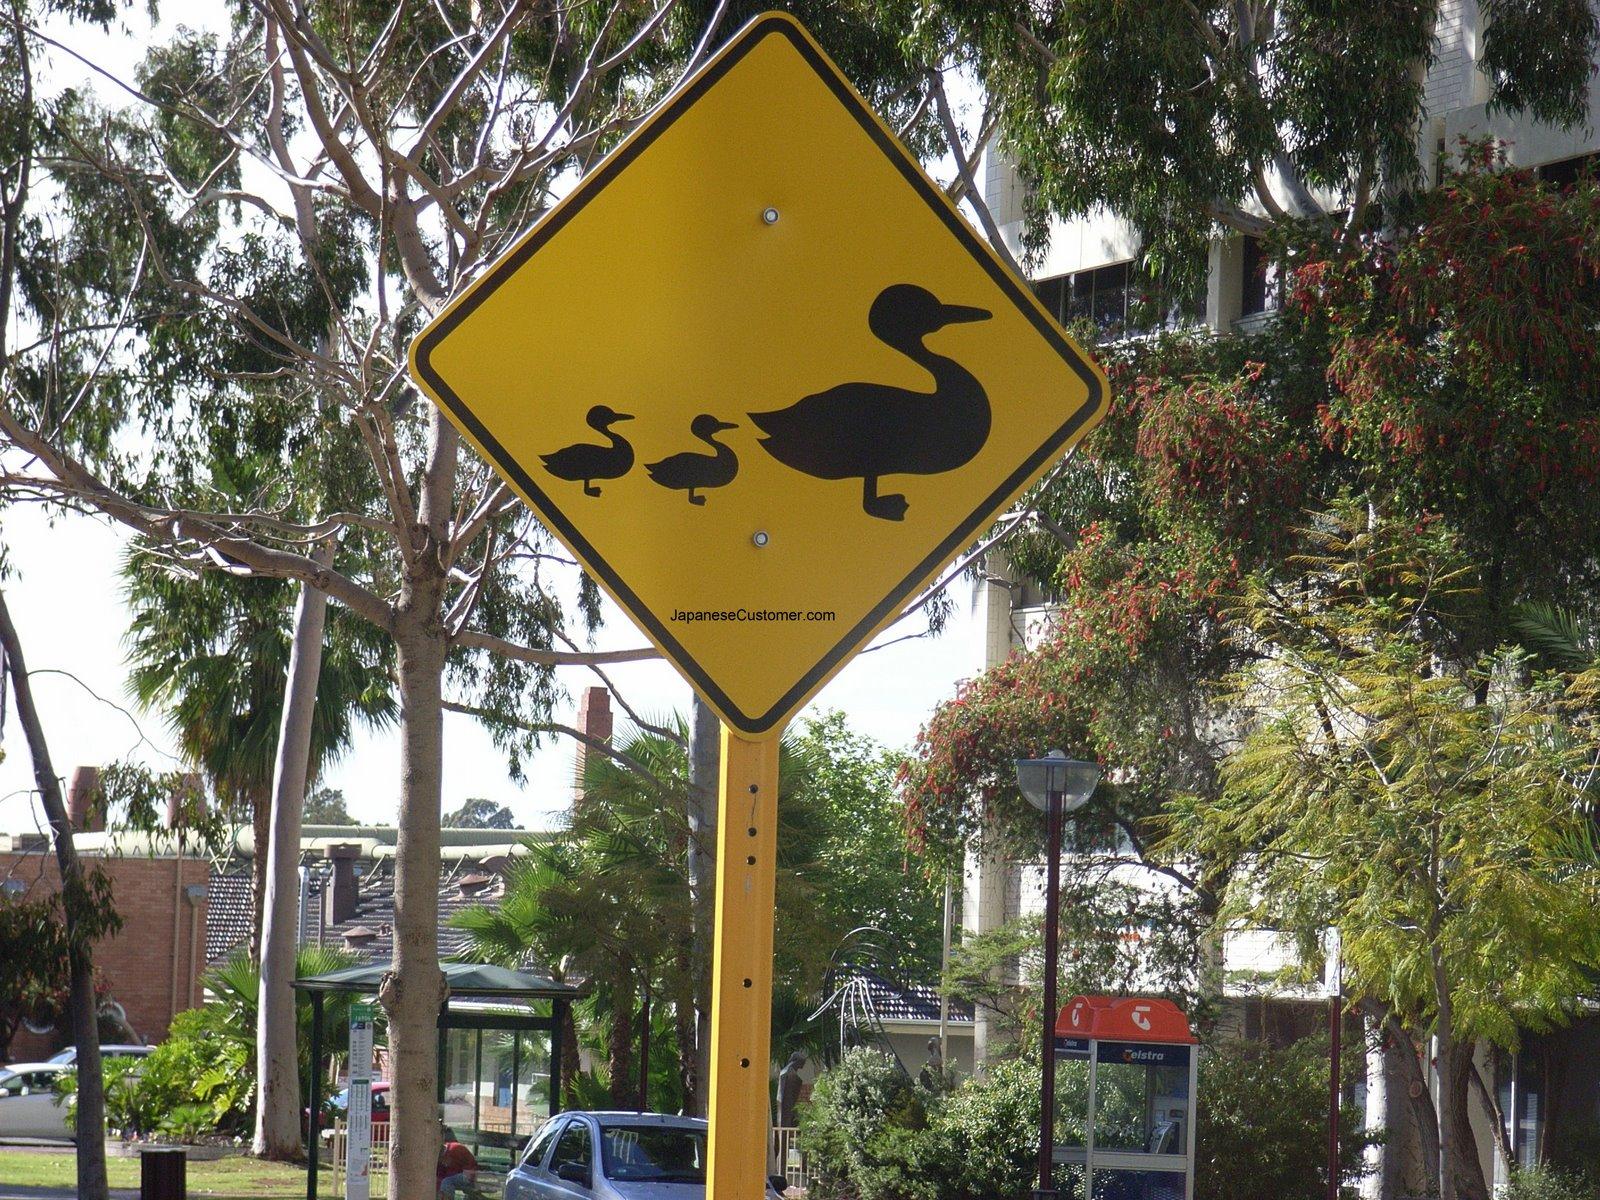 Surburban street scene, Australia Copyright Peter Hanami 2006